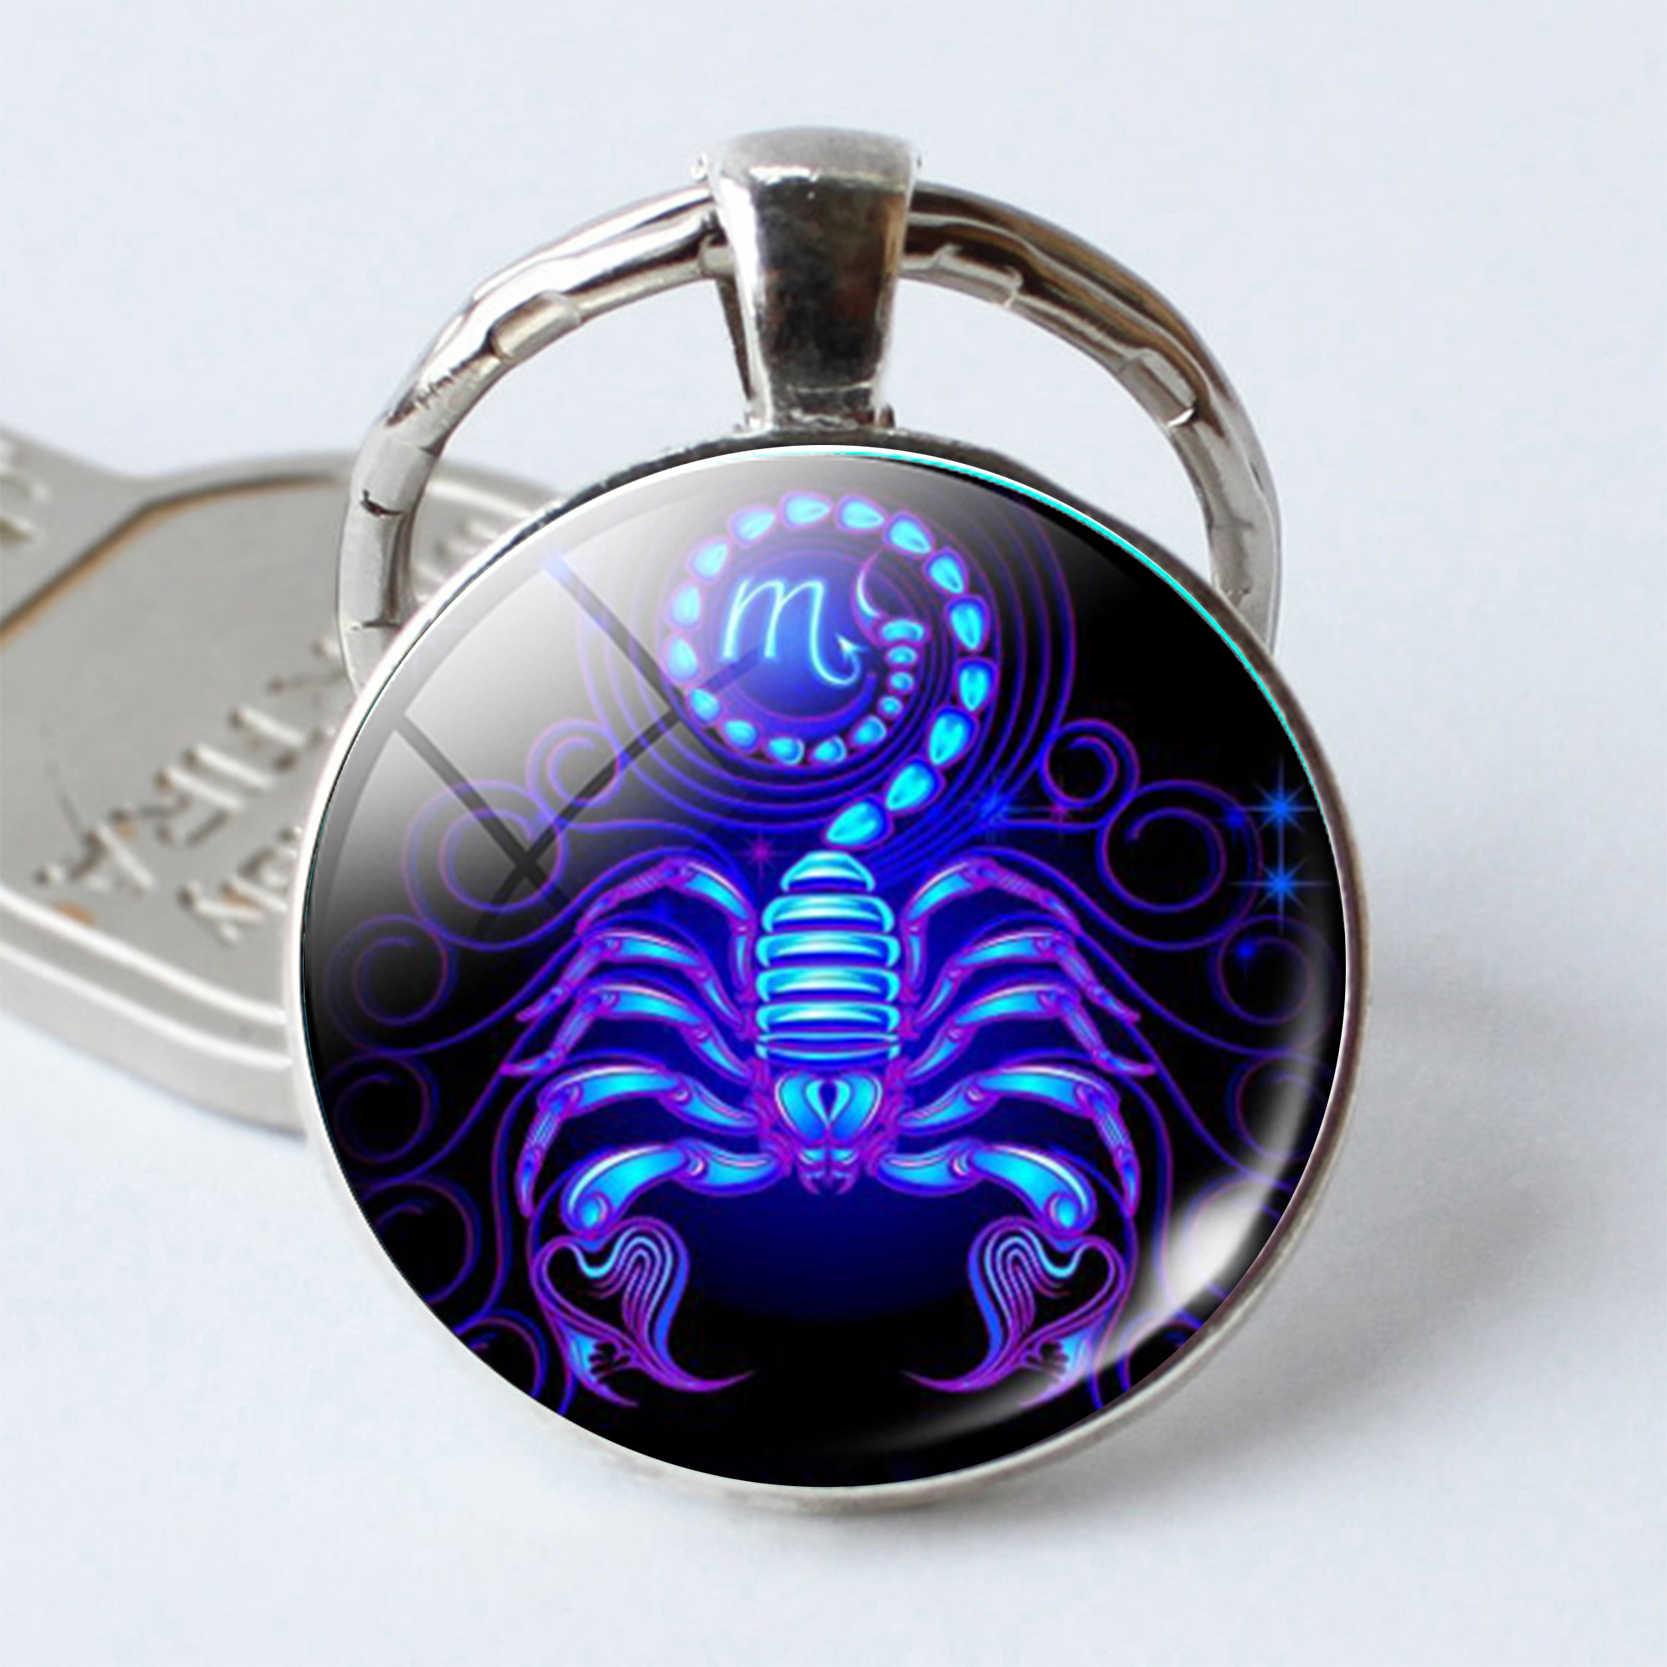 ScorpioKey โซ่ Glas Silver Plated Key แหวนราศีพิจิกแก้วรอบ Keyrings ของขวัญวันวาเลนไทน์สำหรับเธอเขา